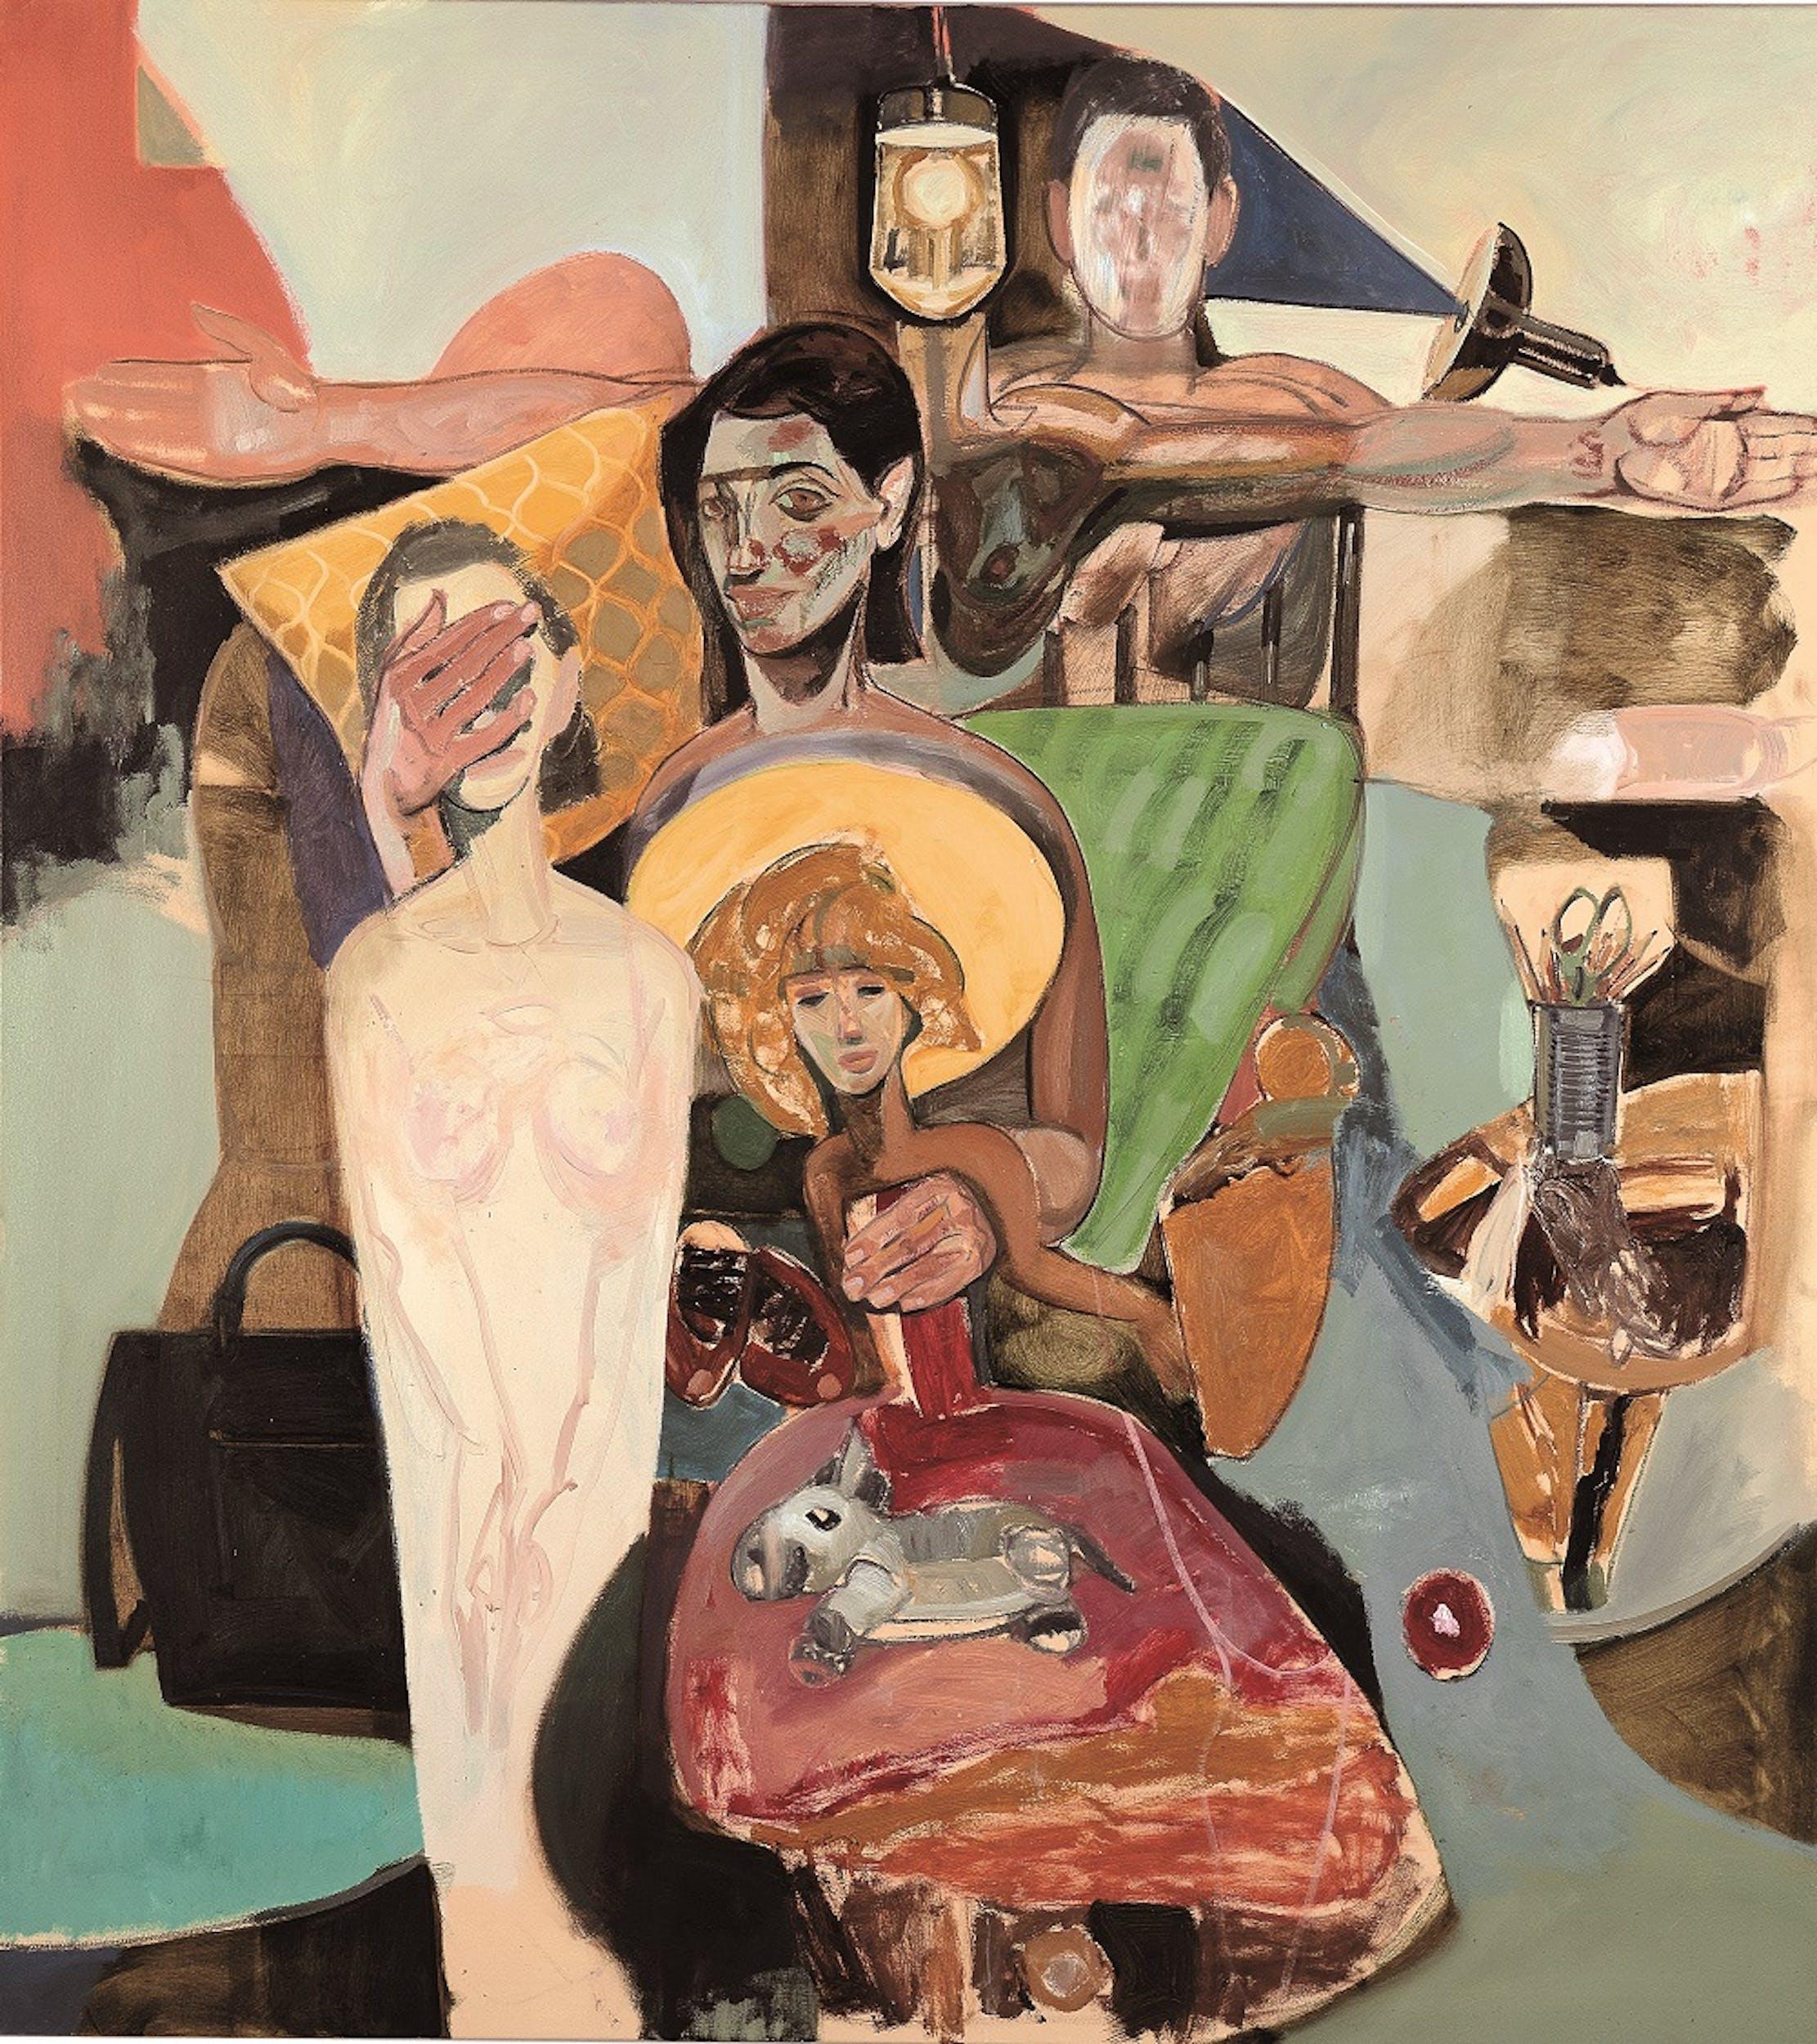 Tesfaye Urgessa, Ich halte dich fest halten 2 (I hold you firmly 2, Ti tengo stretto 2), 2018, olio su tela, oil on canvas.